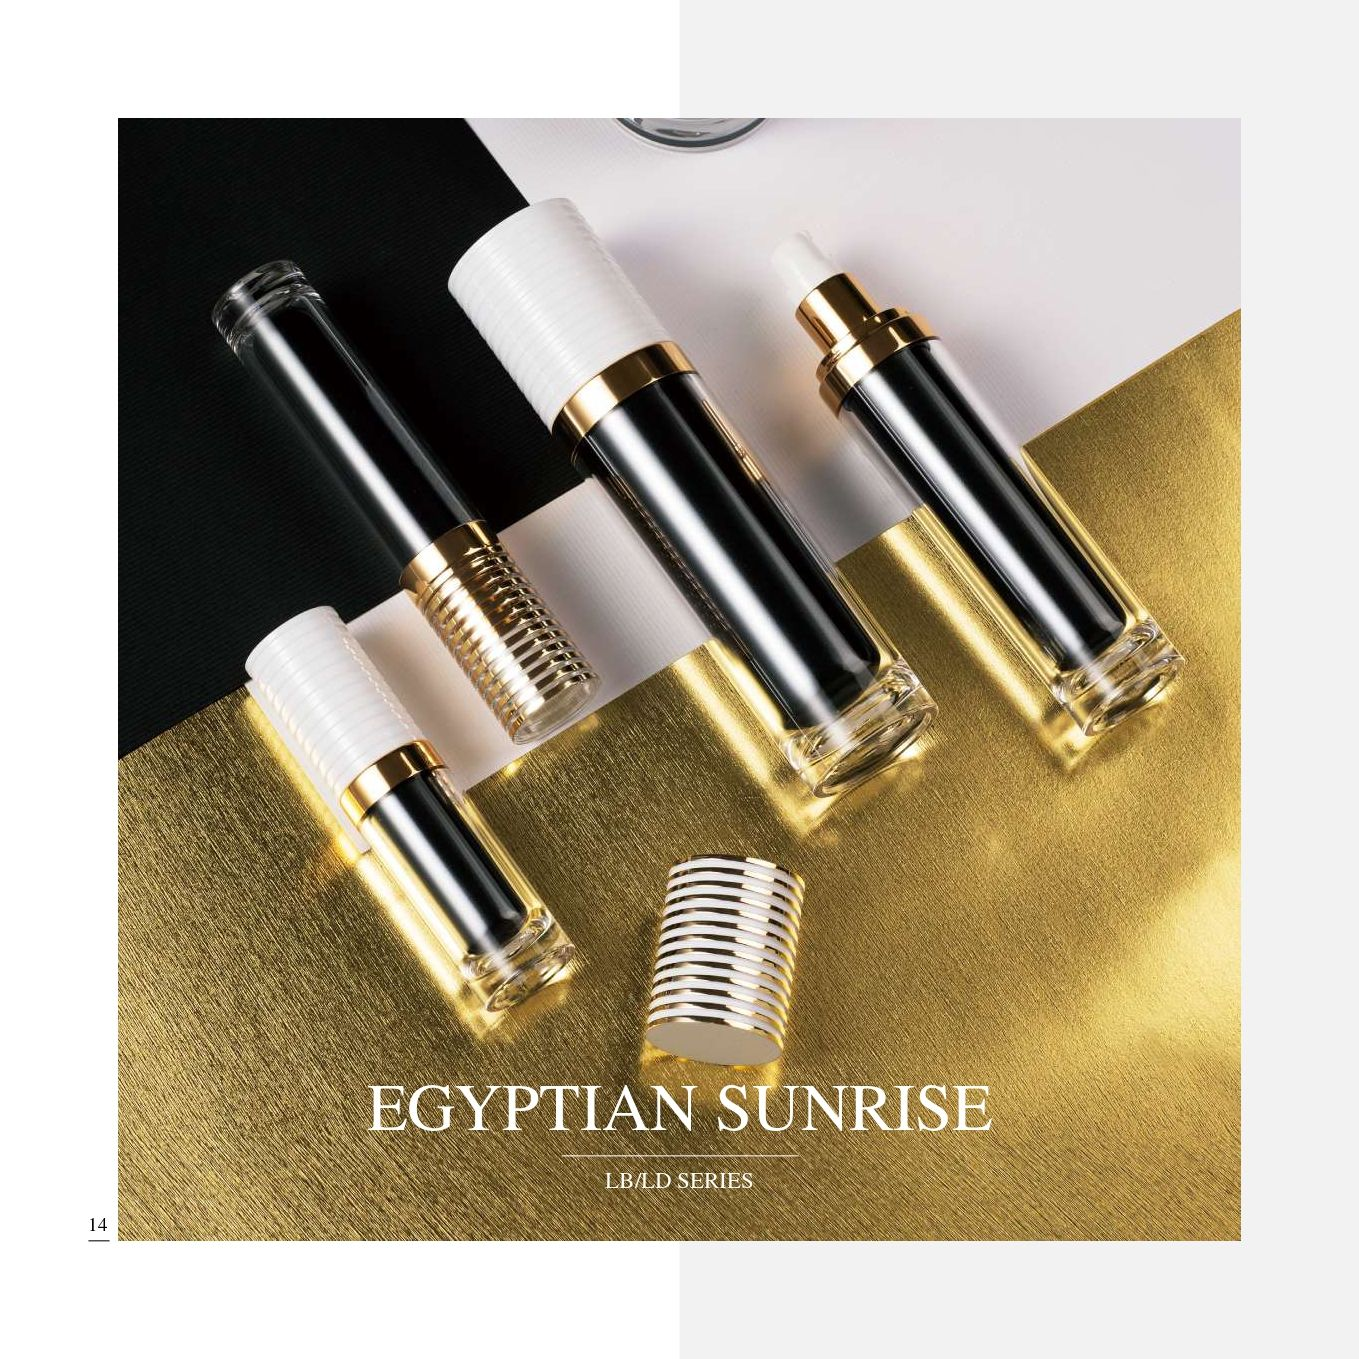 Shiny Rim Round Shape Acrylic Luxury Cosmetic/Skincare - Cosmetic Packaging Collection - Egyptian Sunrise